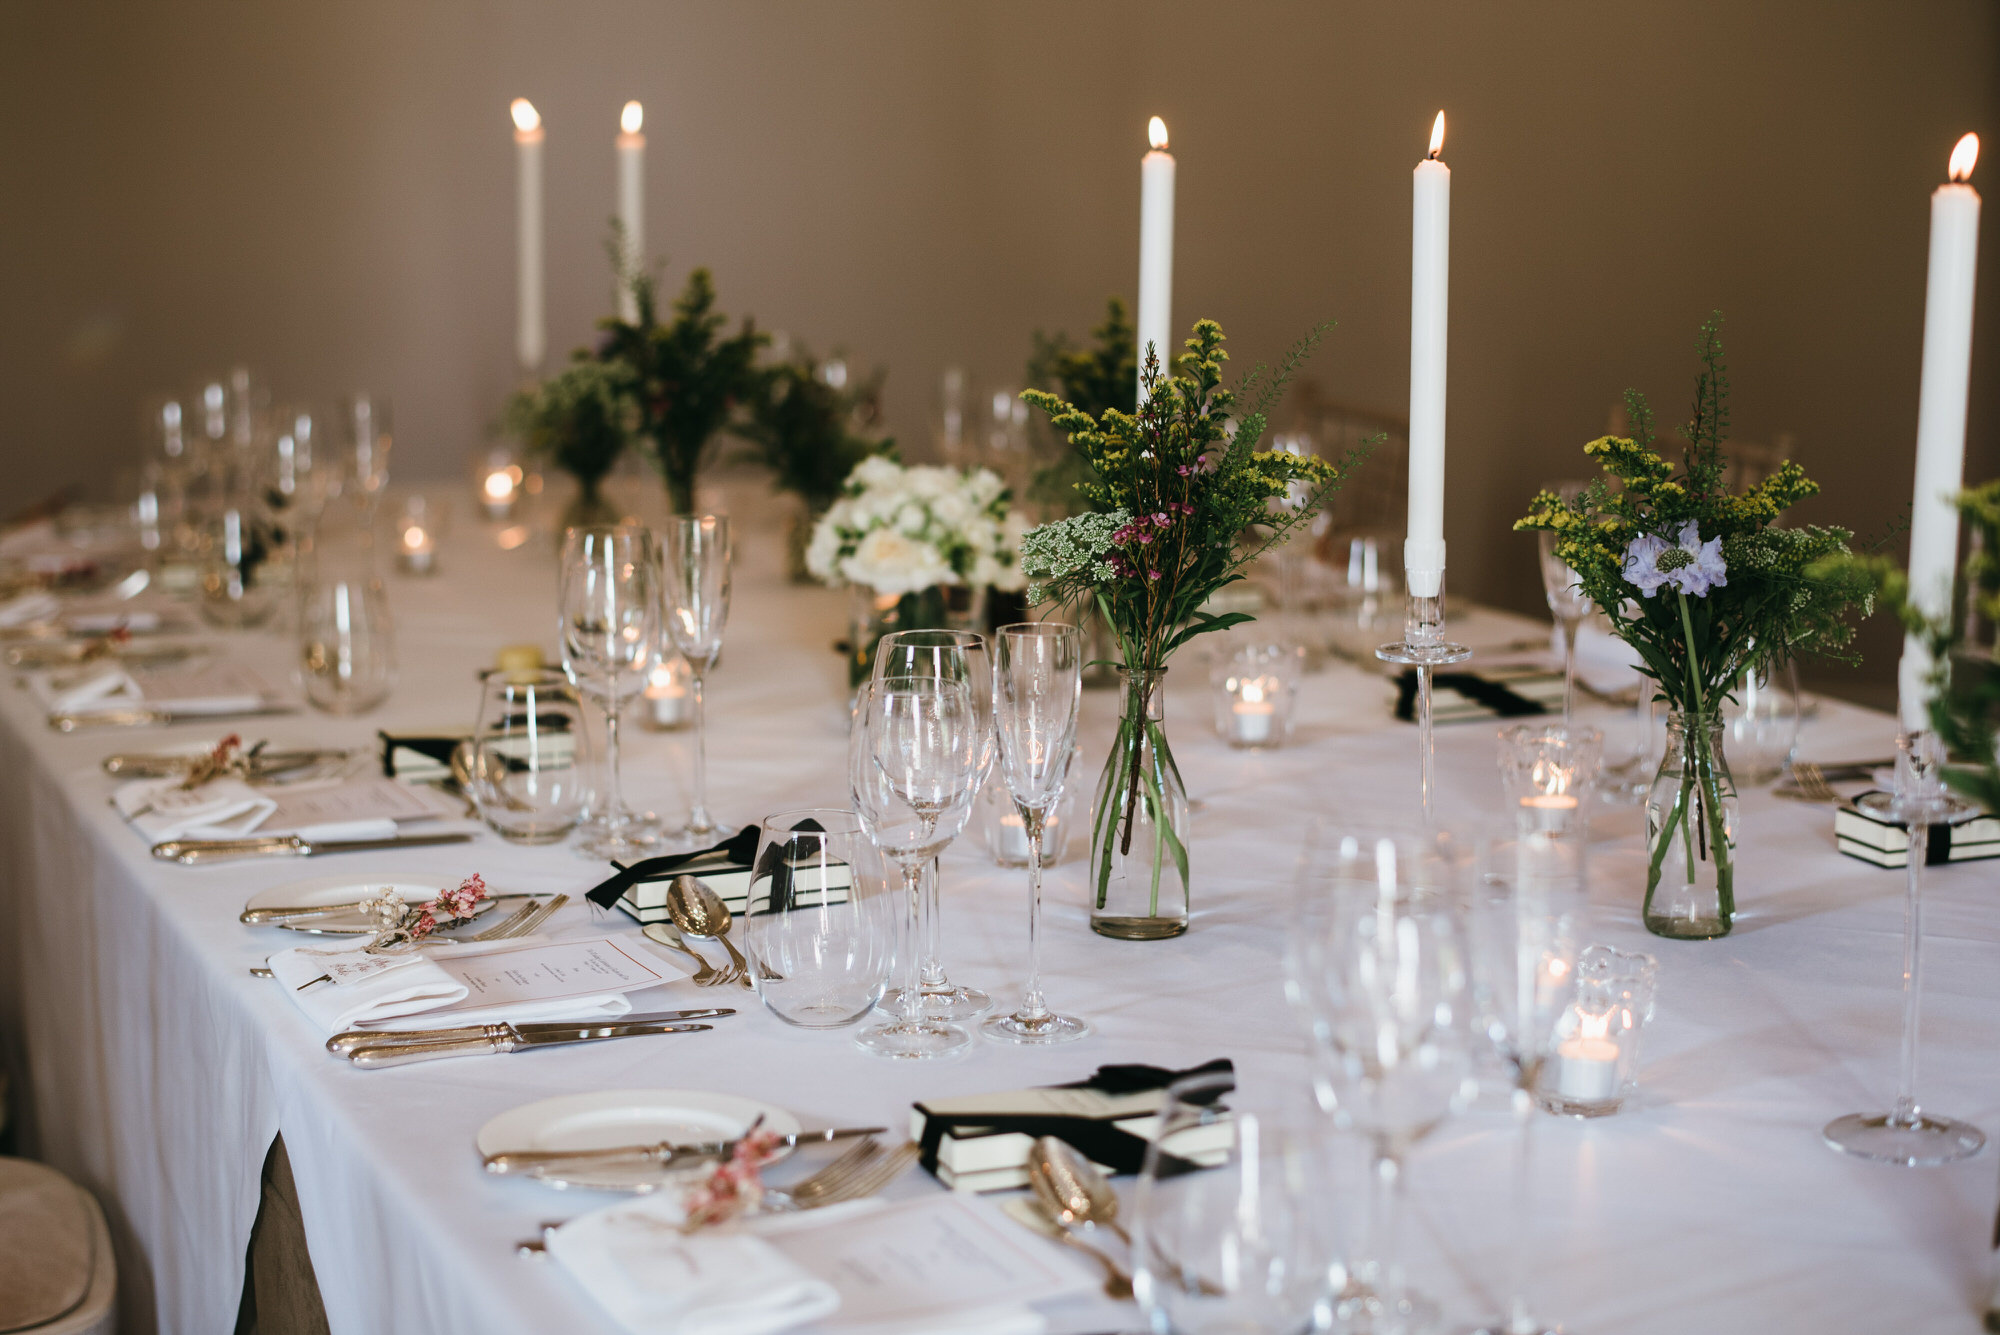 Oak Room Coworth Park wedding